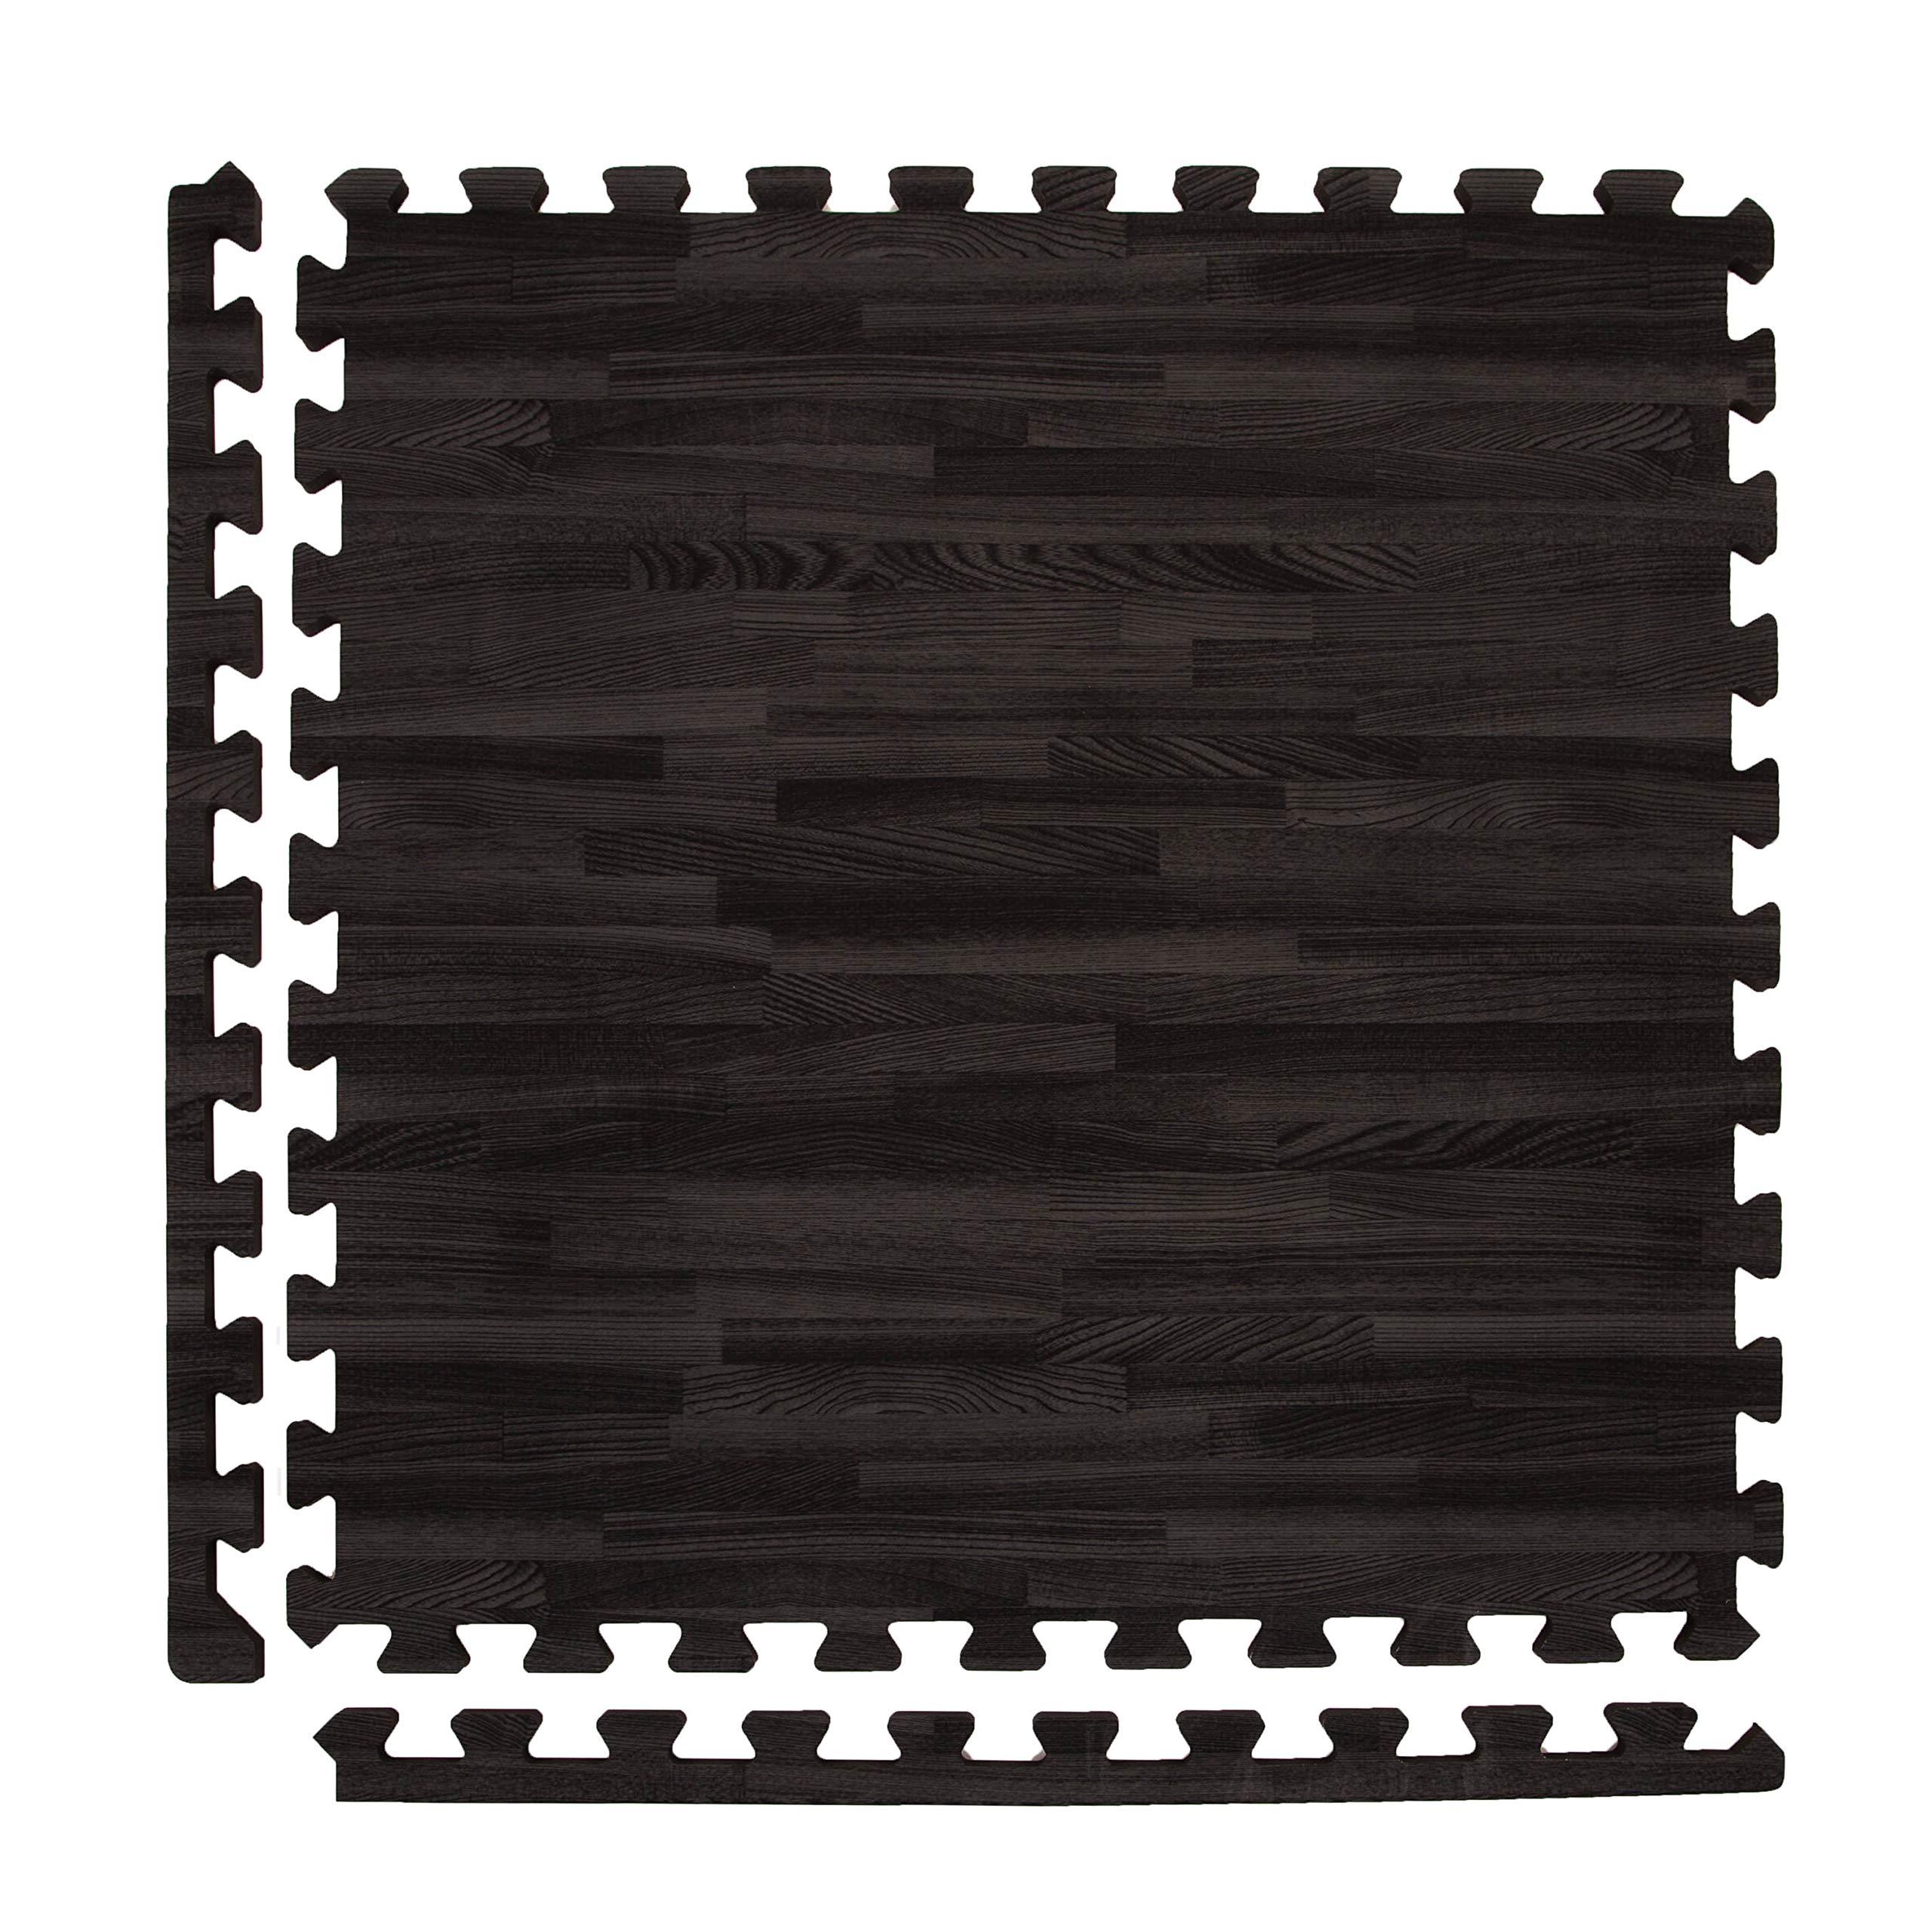 IncStores - Premium Soft Wood Interlocking Foam Tiles (Black, 6 Tiles) - Excellent for Trade Show Flooring, Exhibit Flooring, Display Flooring, Conventions, Living Areas, Play Rooms, Yoga and Pilates